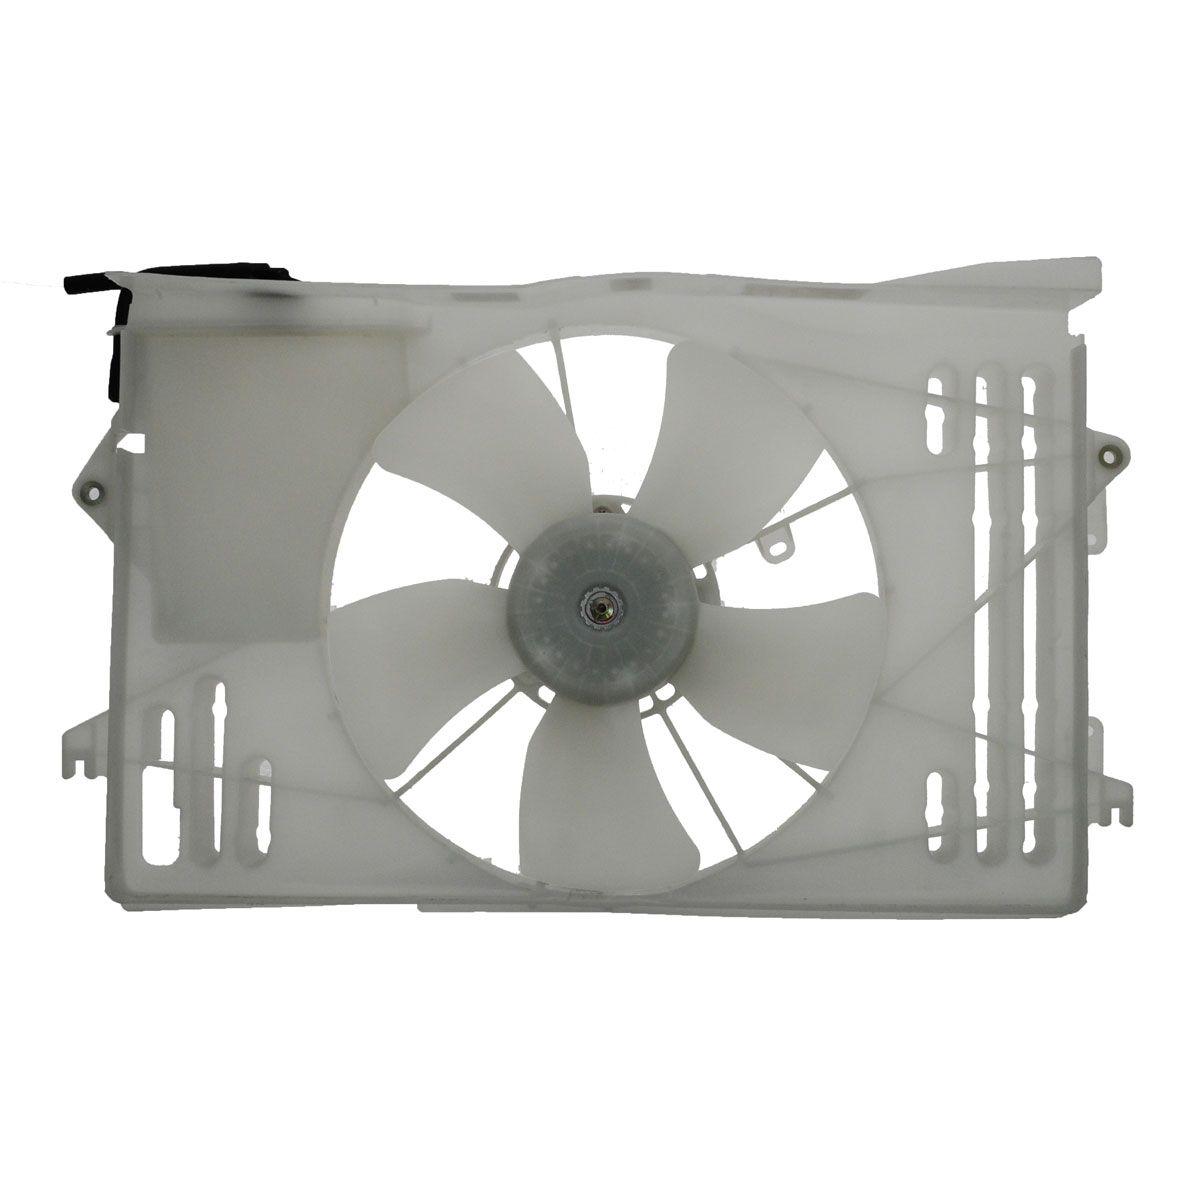 Radiator Cooling Fan Motor Assembly For Toyota Matrix Corolla Vibe 2006 Electrical Wiring Diagram Manual Ebay